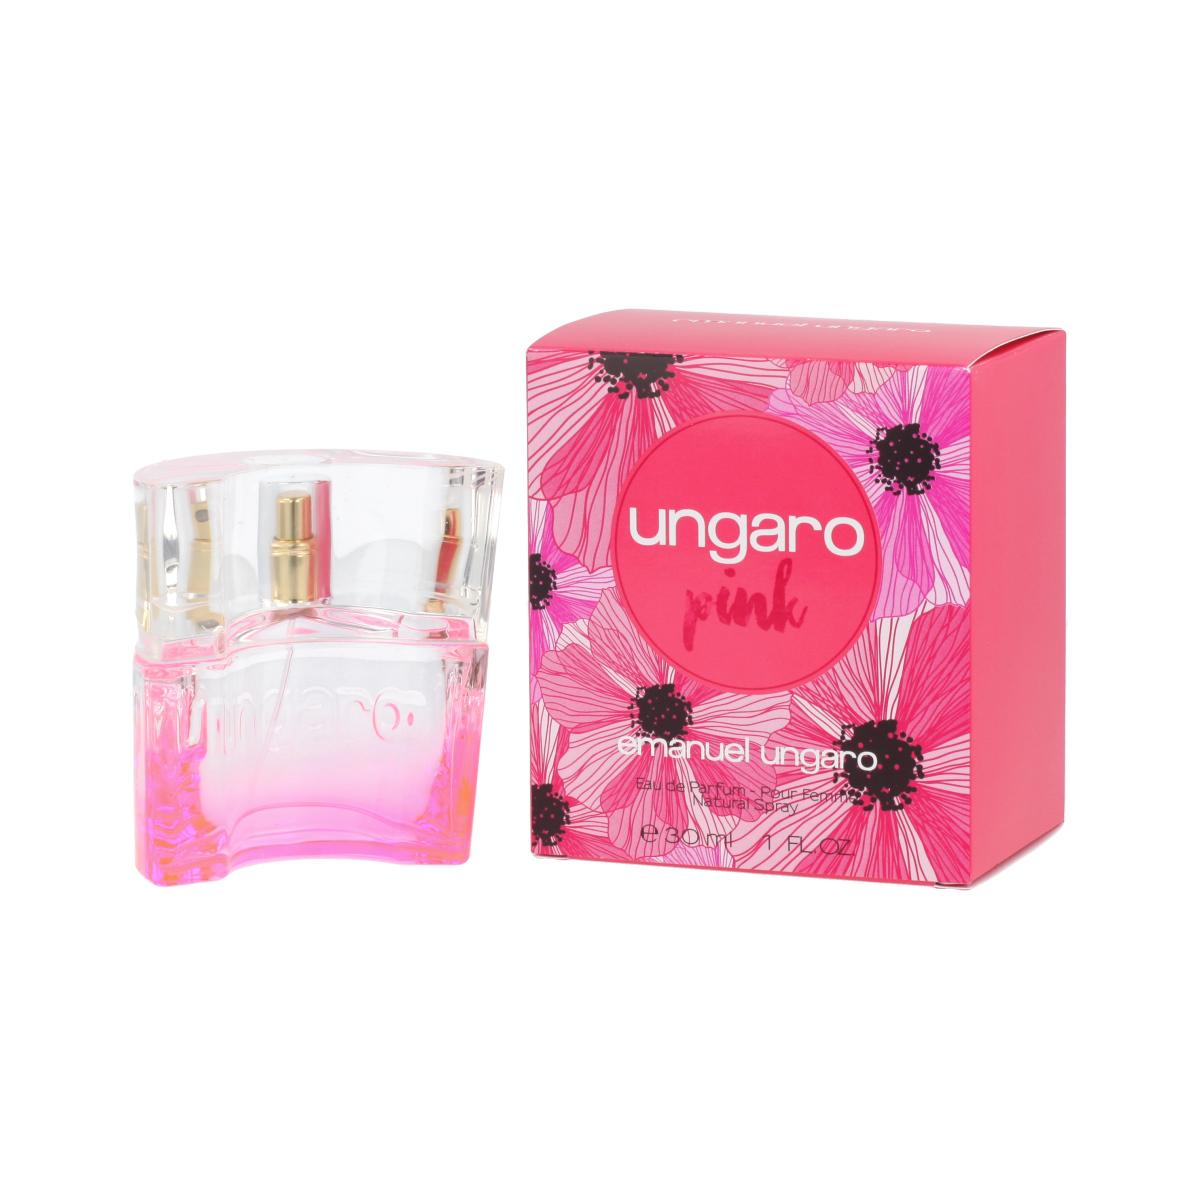 Ungaro Emanuel Ungaro Pink Eau De Parfum 30 ml (woman) 14016